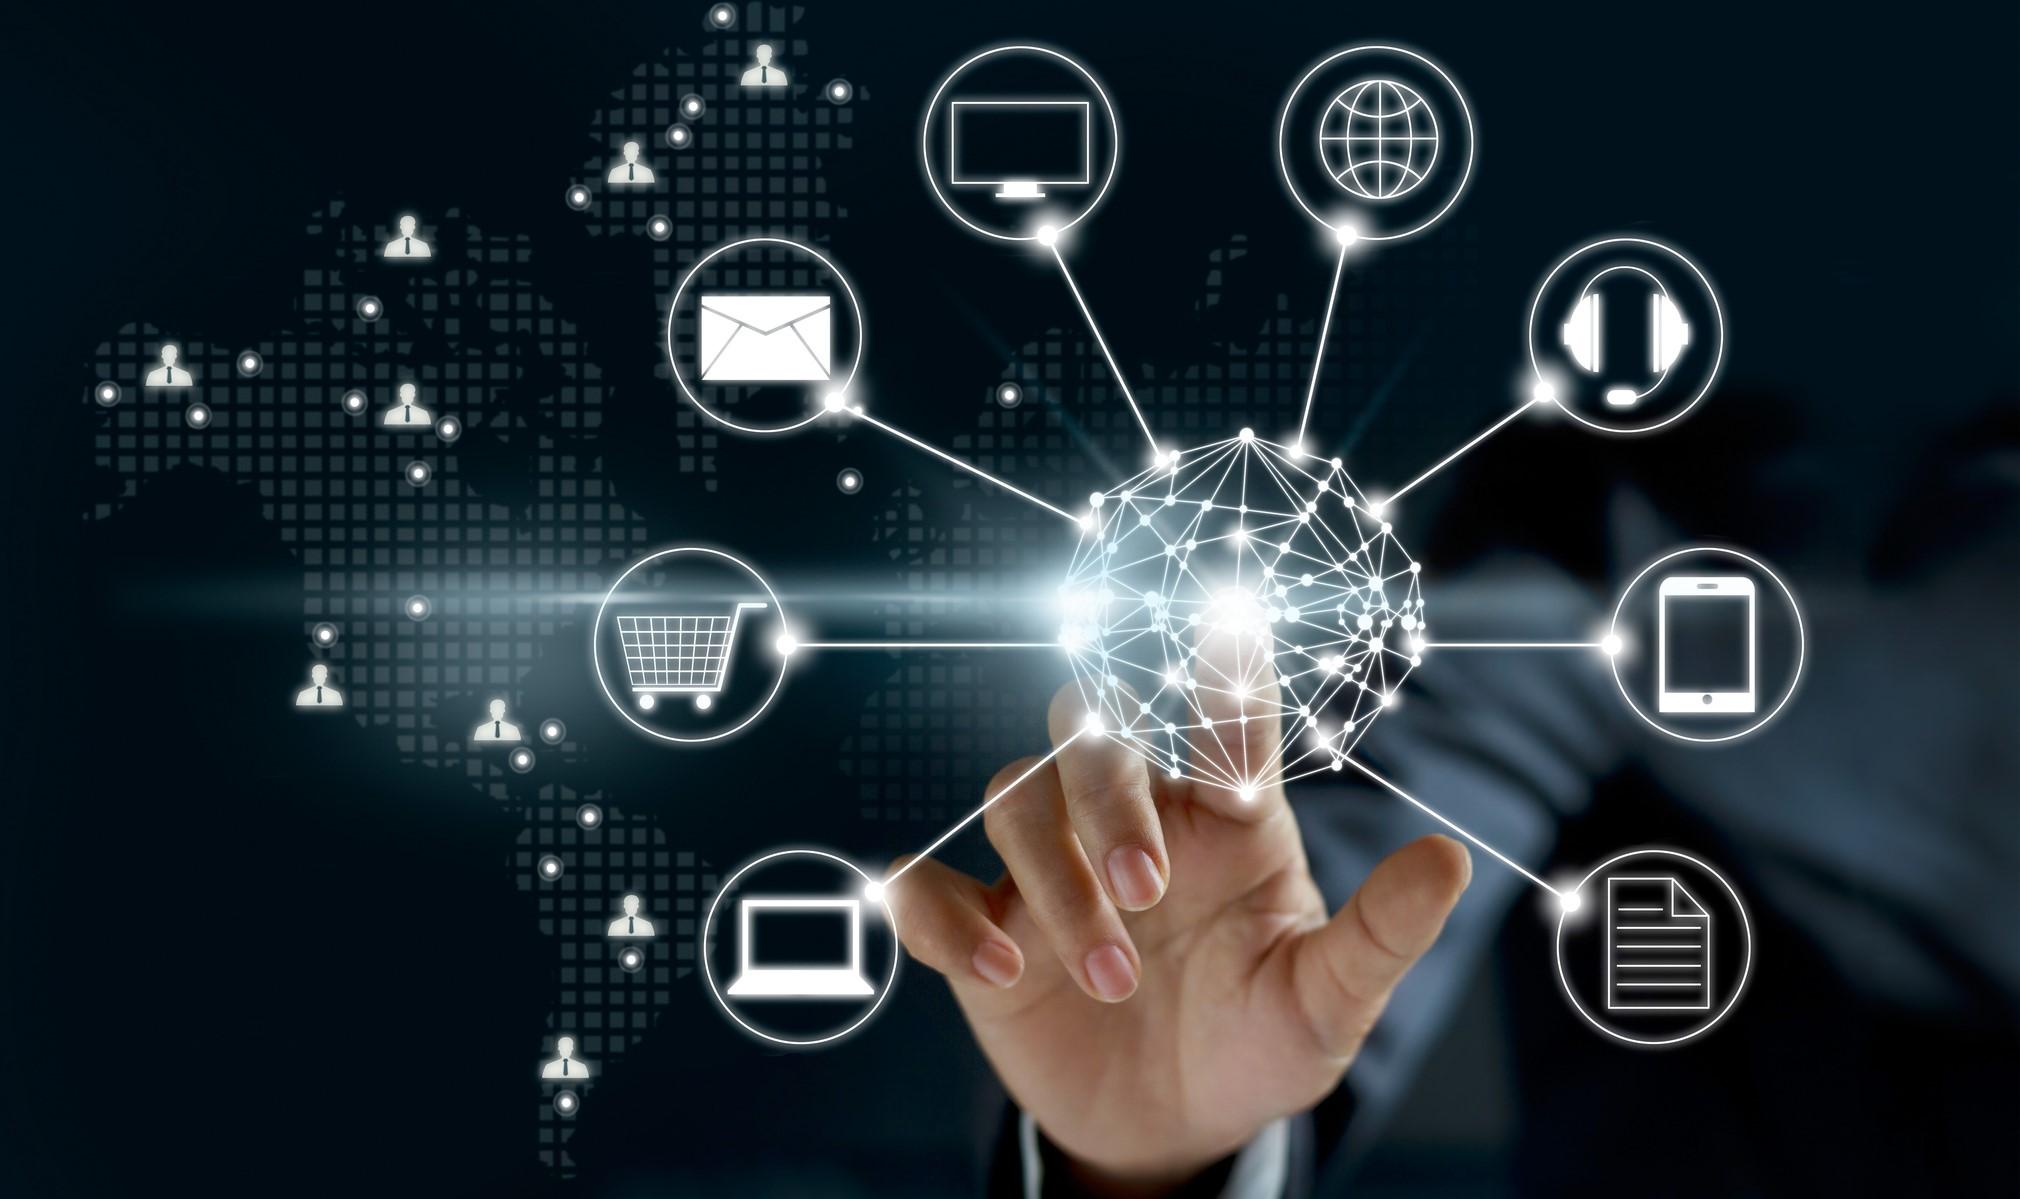 2018 CSL Online Education Teacher Training: Skills, Abilities & Knowledge